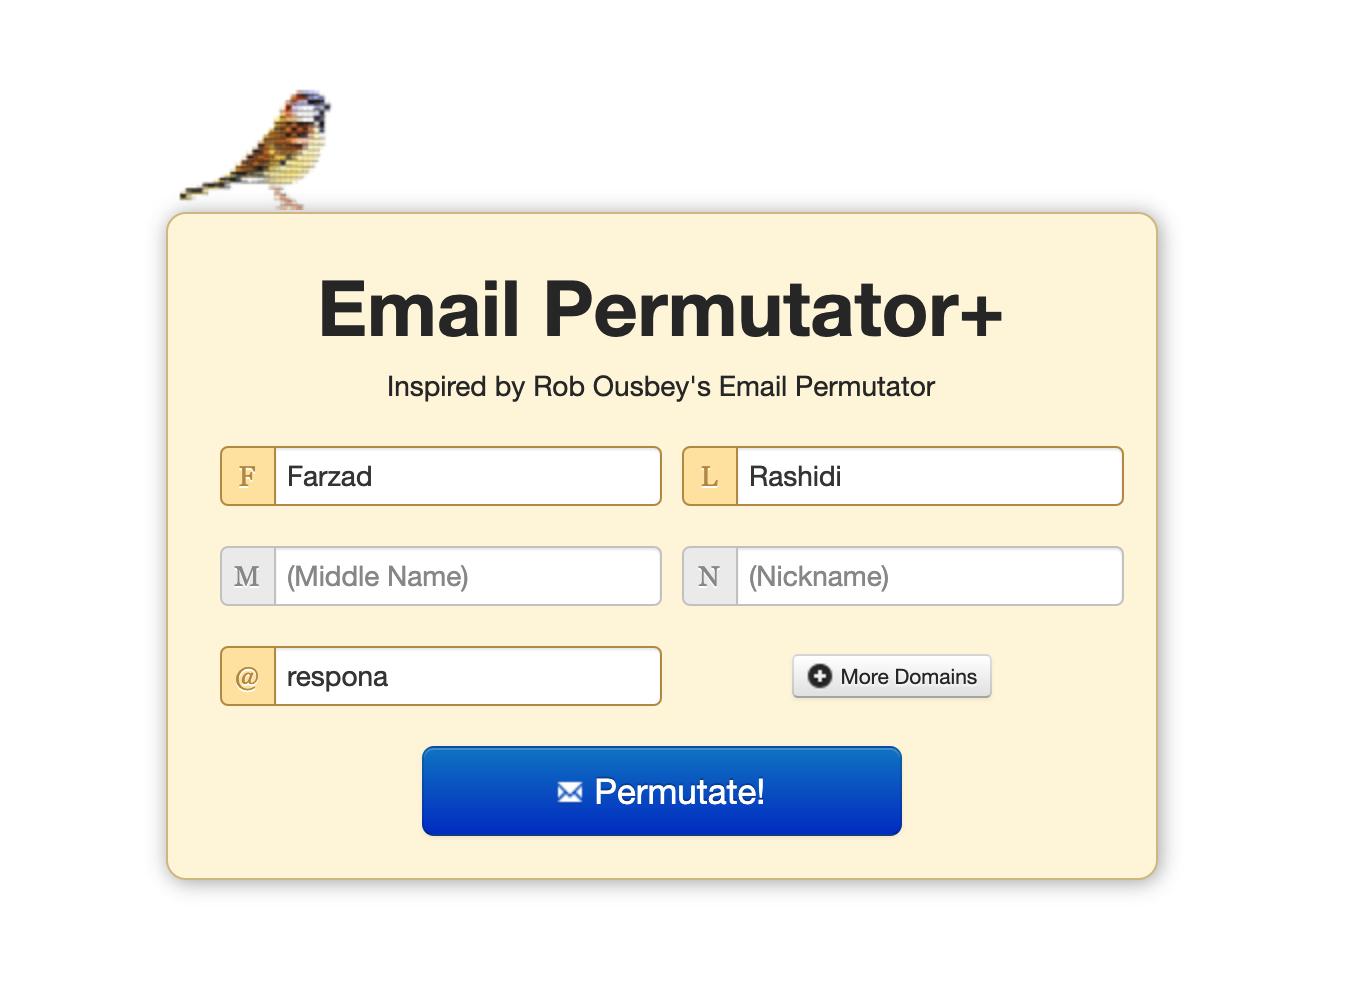 Email permutator example